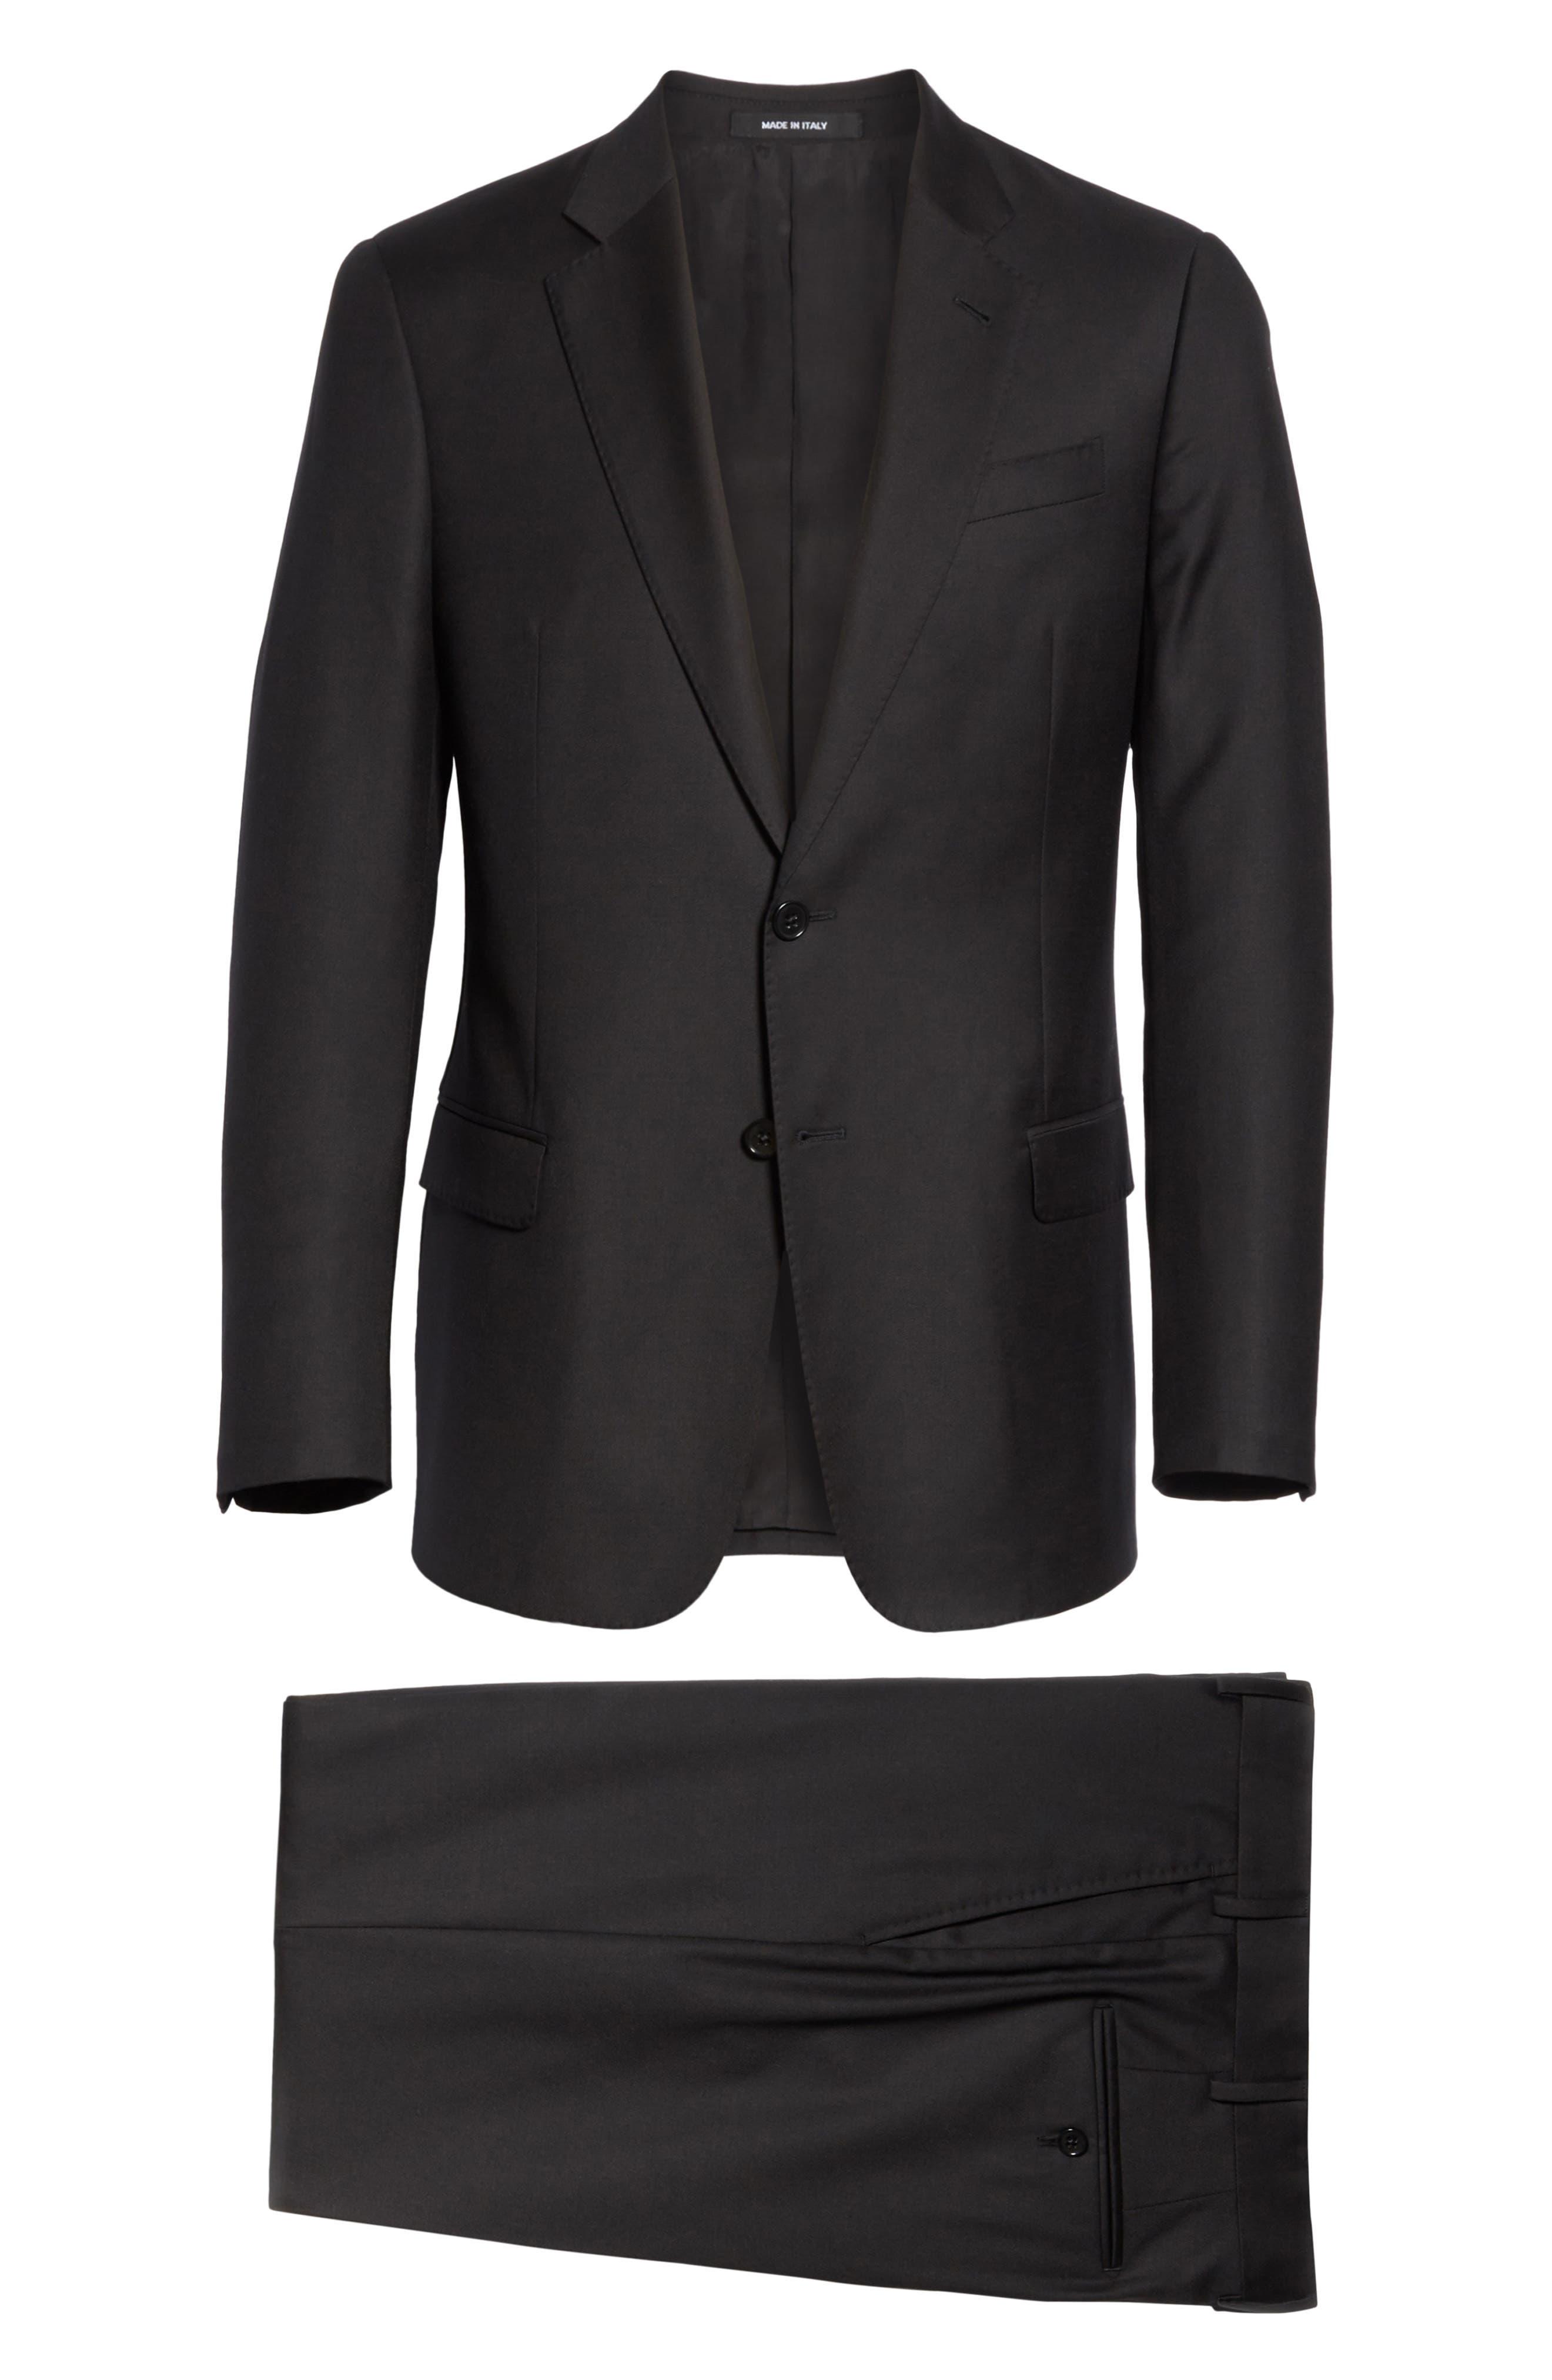 EMPORIO ARMANI, Trim Fit Solid Wool Suit, Alternate thumbnail 8, color, BLACK